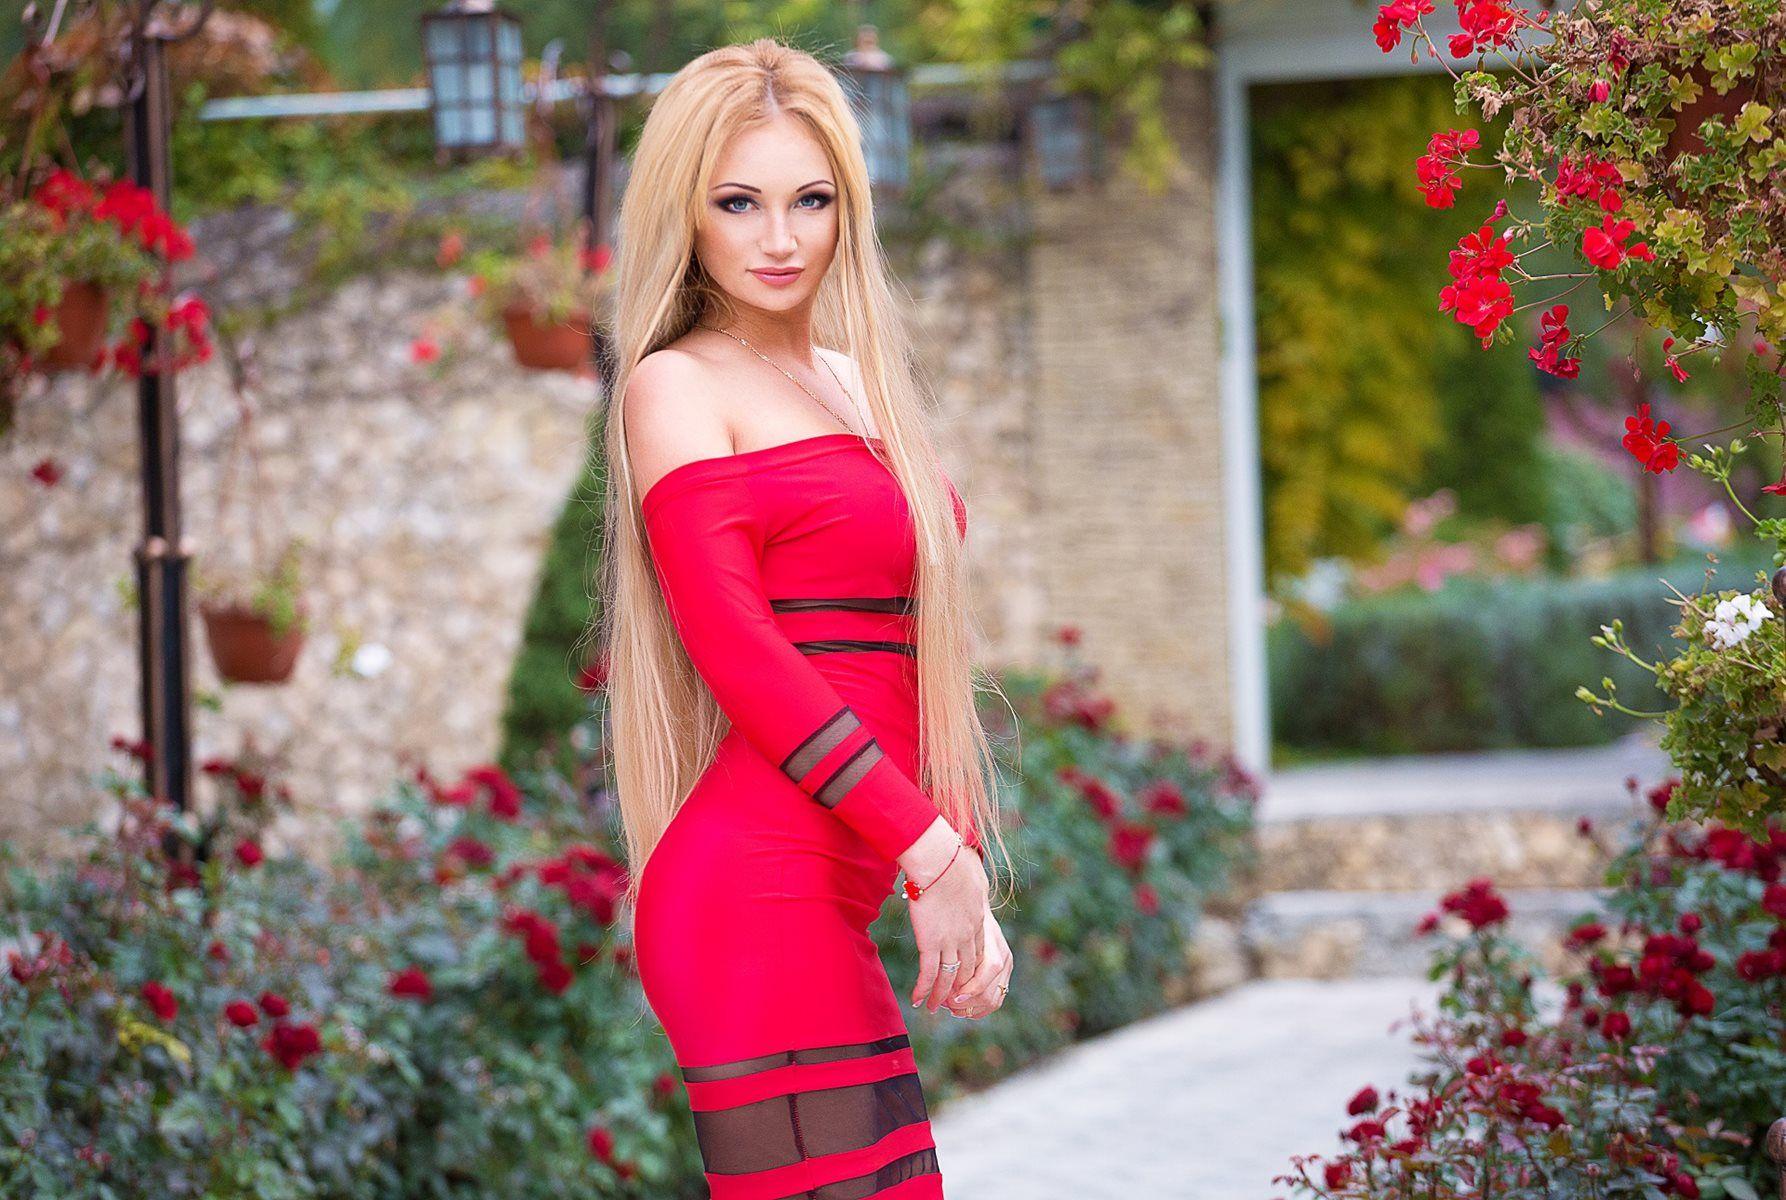 Знакомства 13-17 лет украина знакомства красные баки